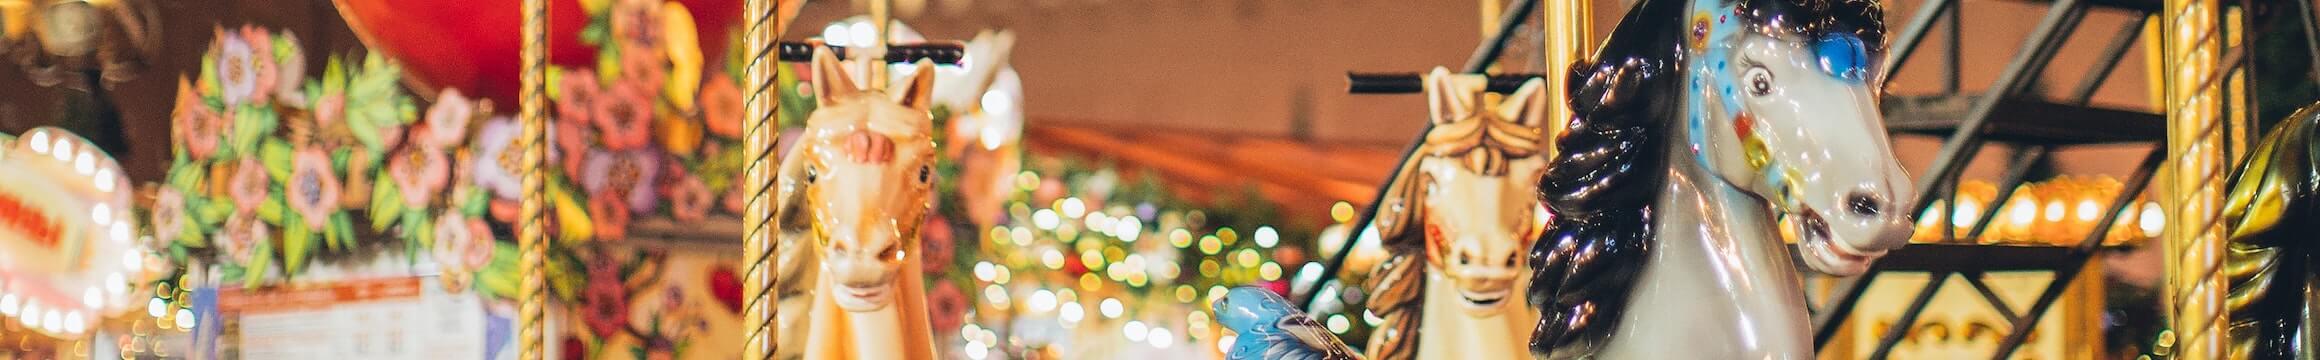 Merrygoround2